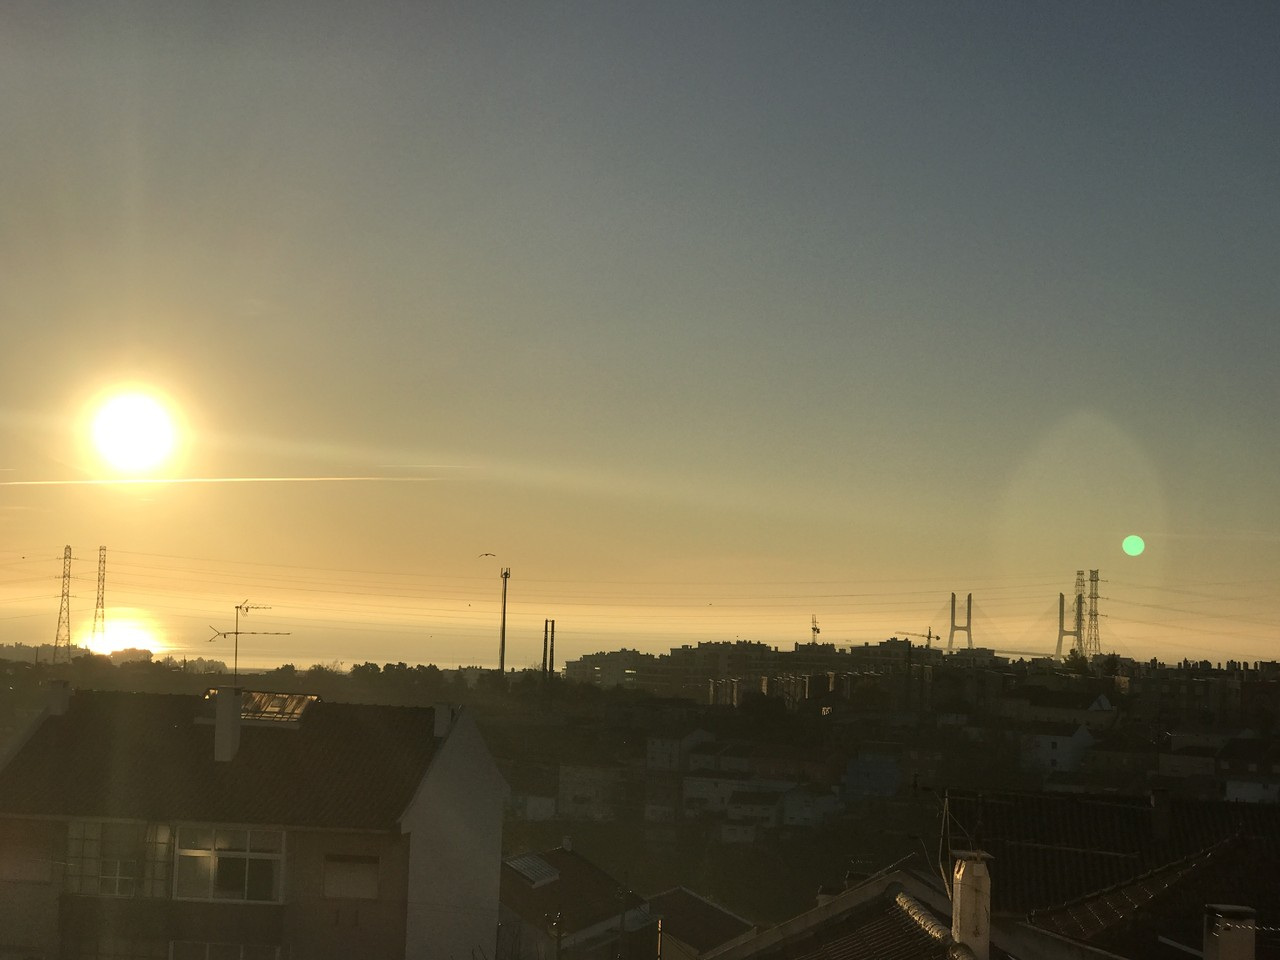 07:23